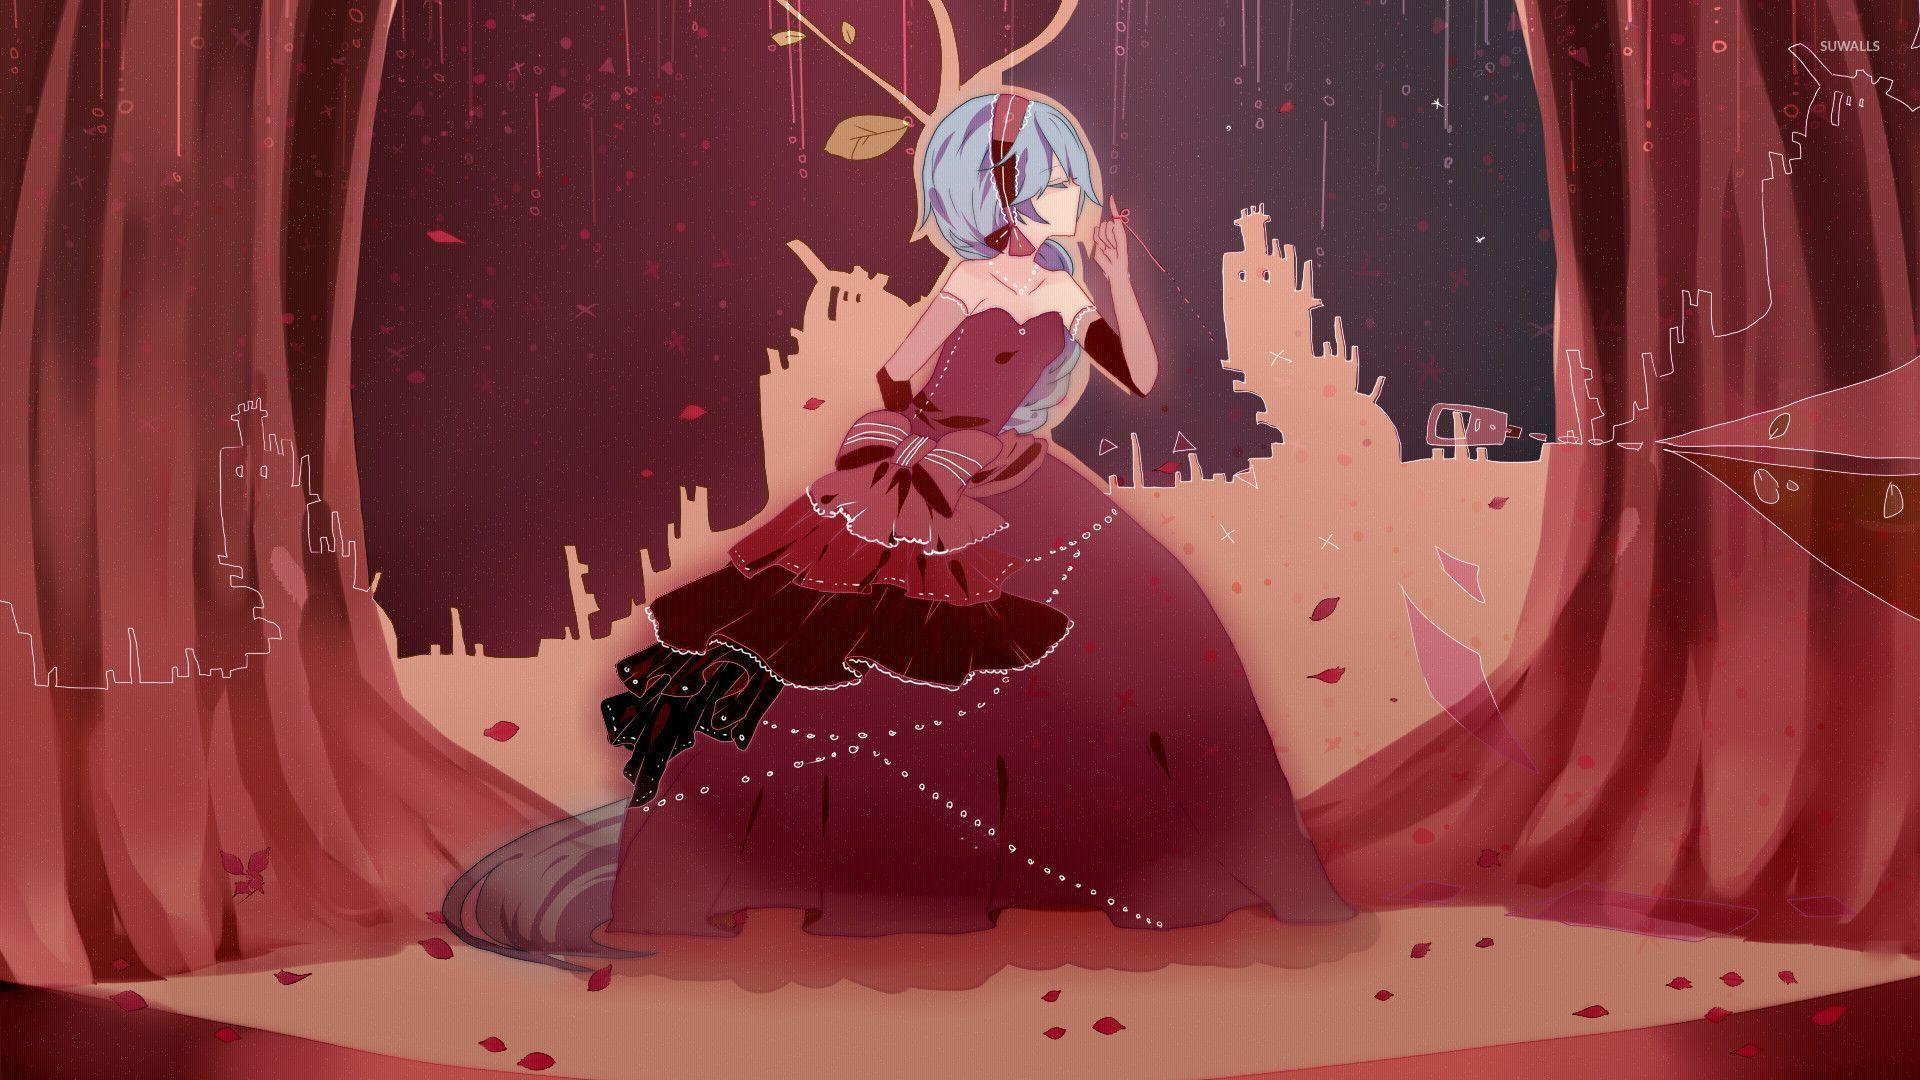 Pretty Girl Wallpapers Hd Anime Princess Wallpaper Anime Wallpapers 26528